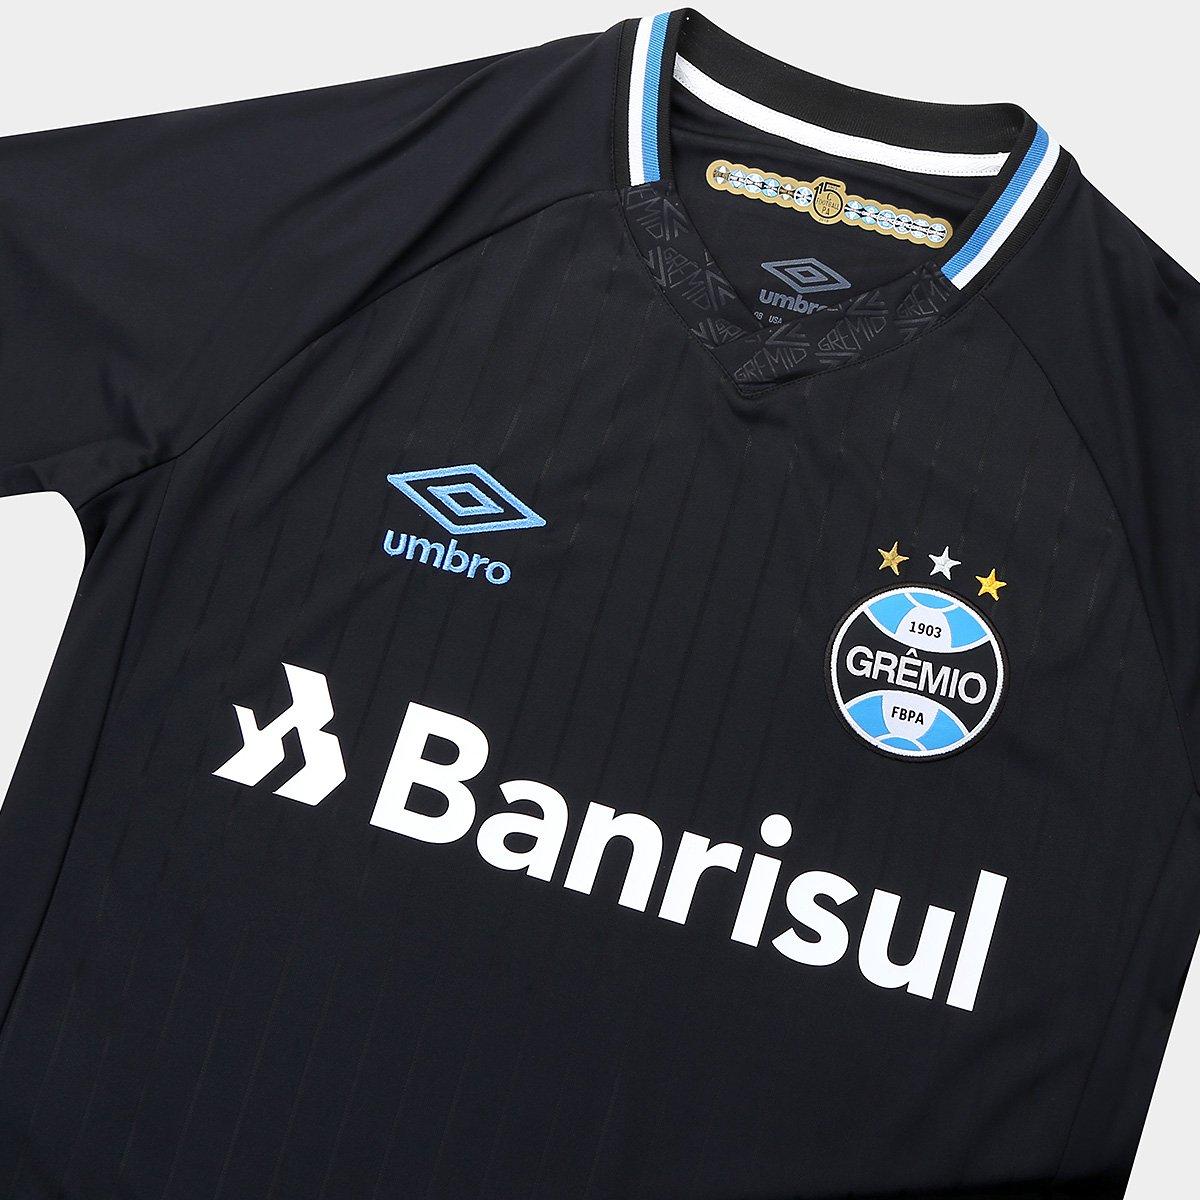 Camisa Grêmio III 2018 s n° Torcedor Umbro Masculina - Preto e ... c5f7cef14cde5